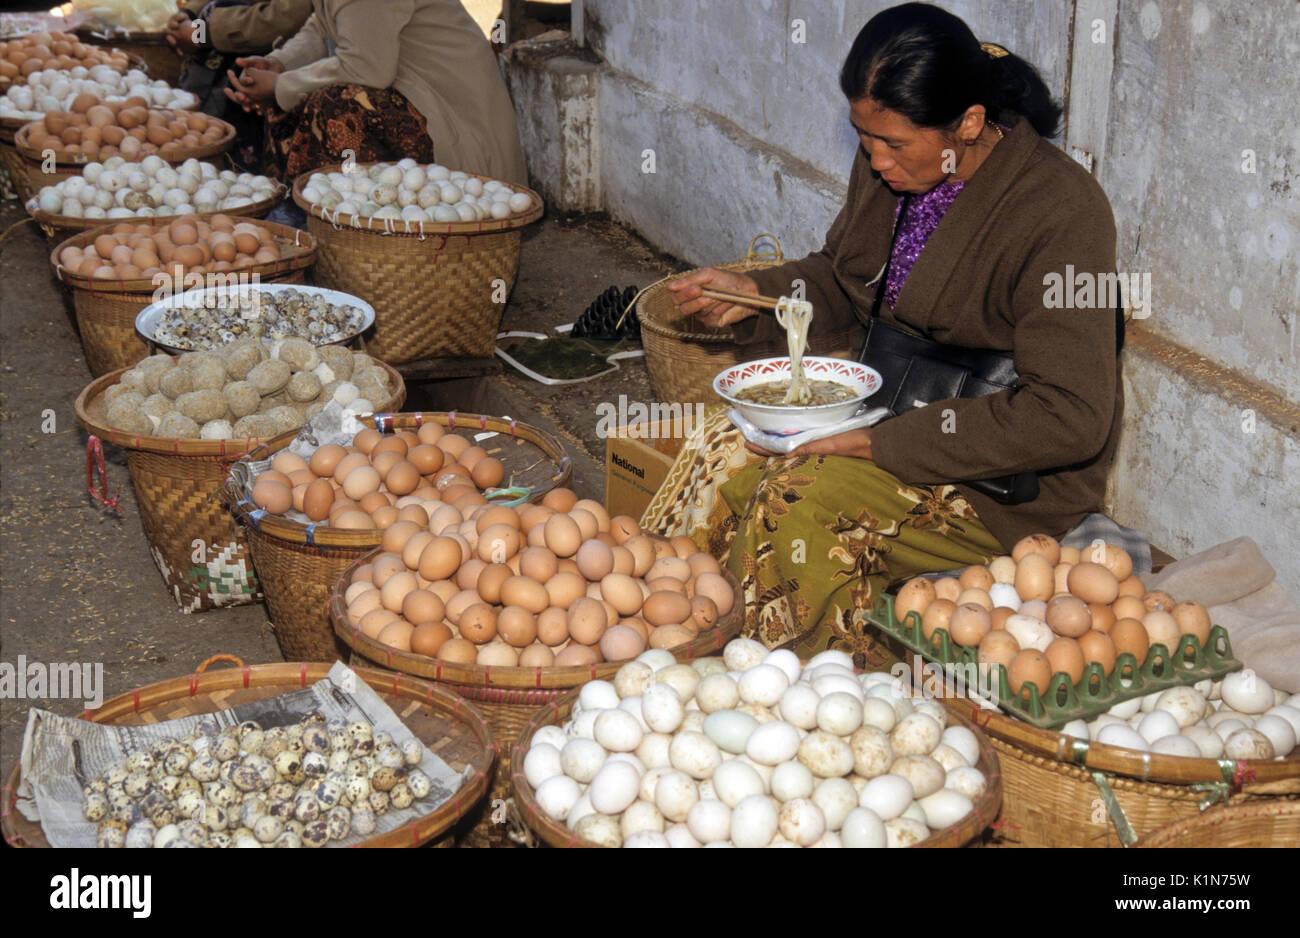 Vendor eating noodles and selling eggs at open-air market, Kengtung (Kyaingtong), Burma (Myanmar) - Stock Image